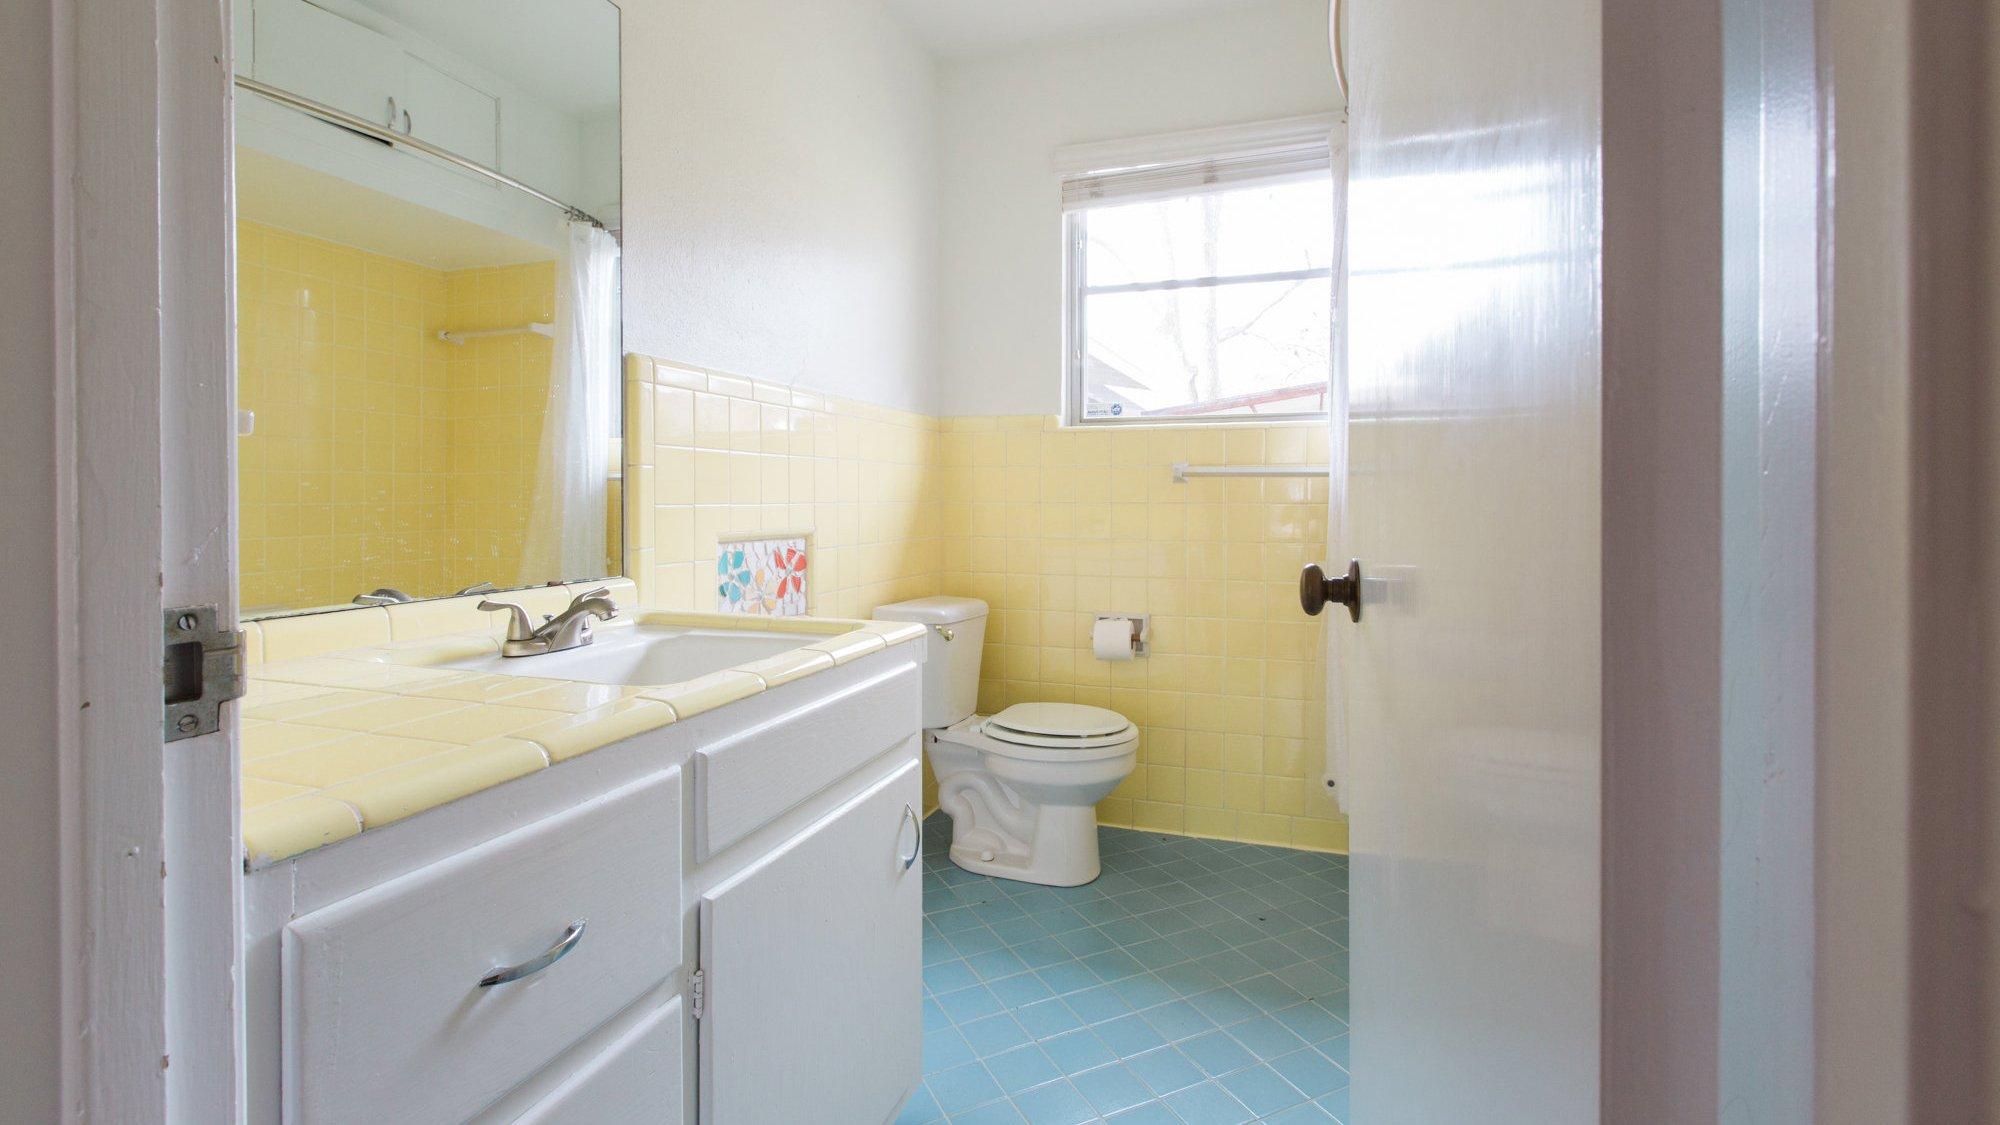 Love_Ding_Blog_Home_Renovation_Master_Bathroom_Diana_Ascarrunz_Photography.jpg